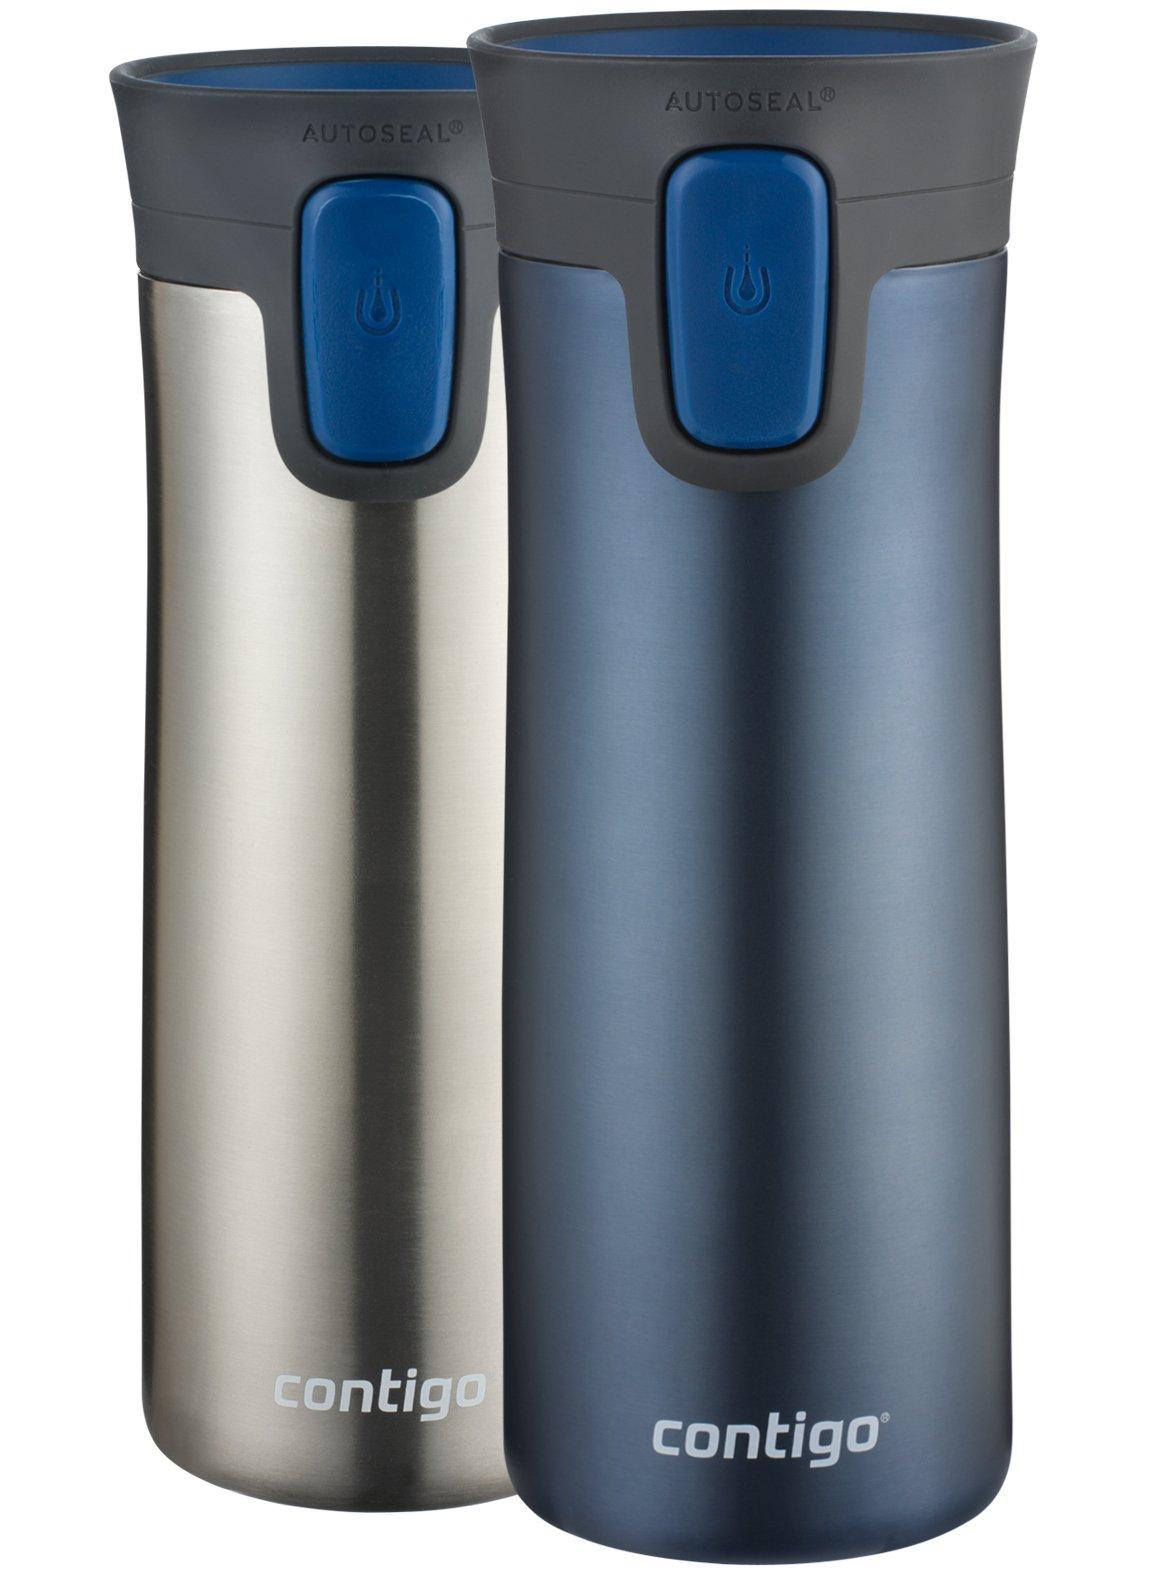 Contigo (2002371) AUTOSEAL Pinnacle Vacuum-Insulated Stainless Steel Travel Mugs, 14 oz, Monaco, 2-Pack